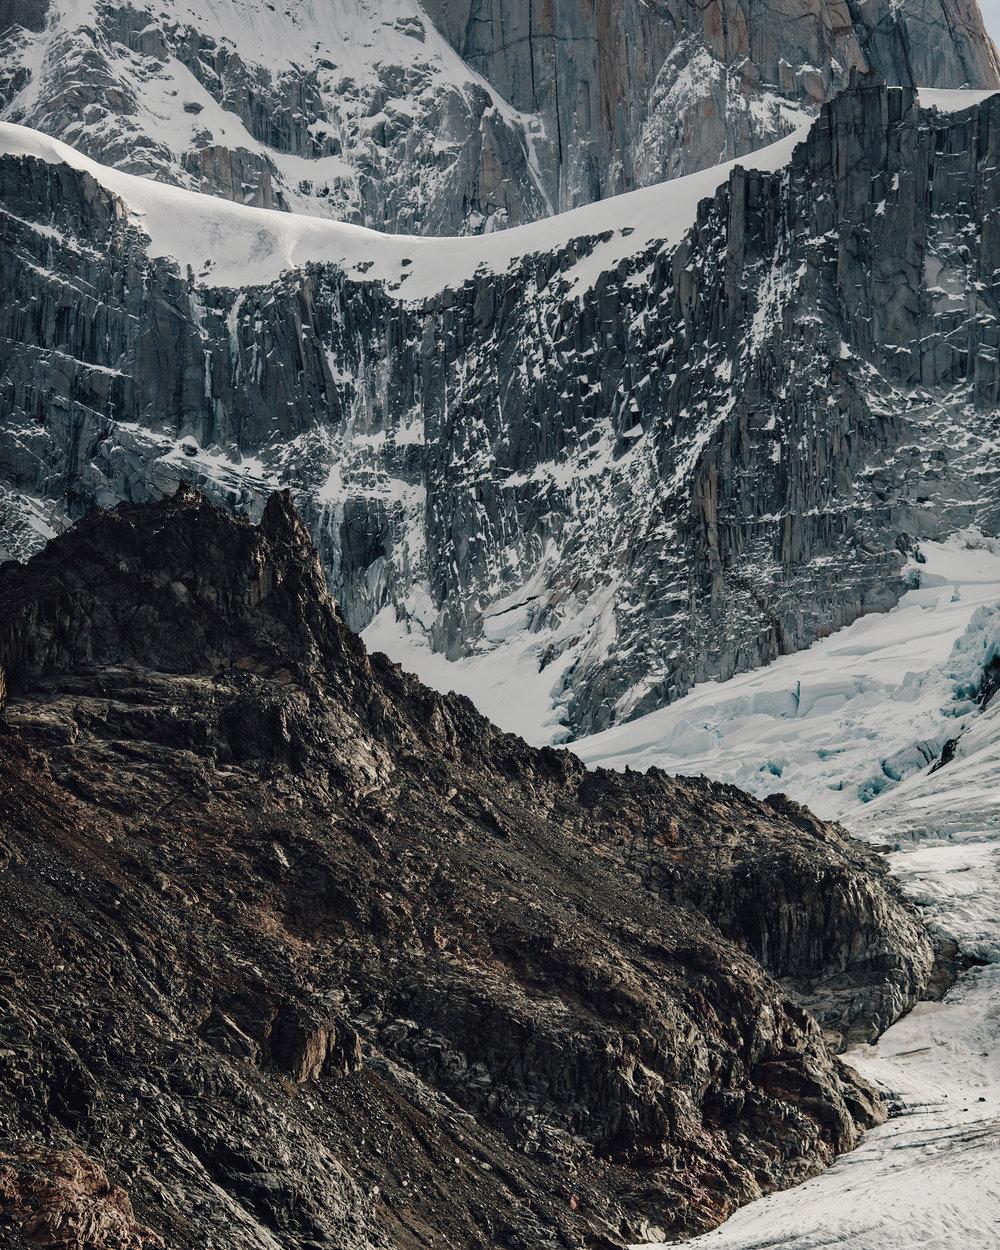 Fitzroy-range-argentina-photography-0013-1.jpg